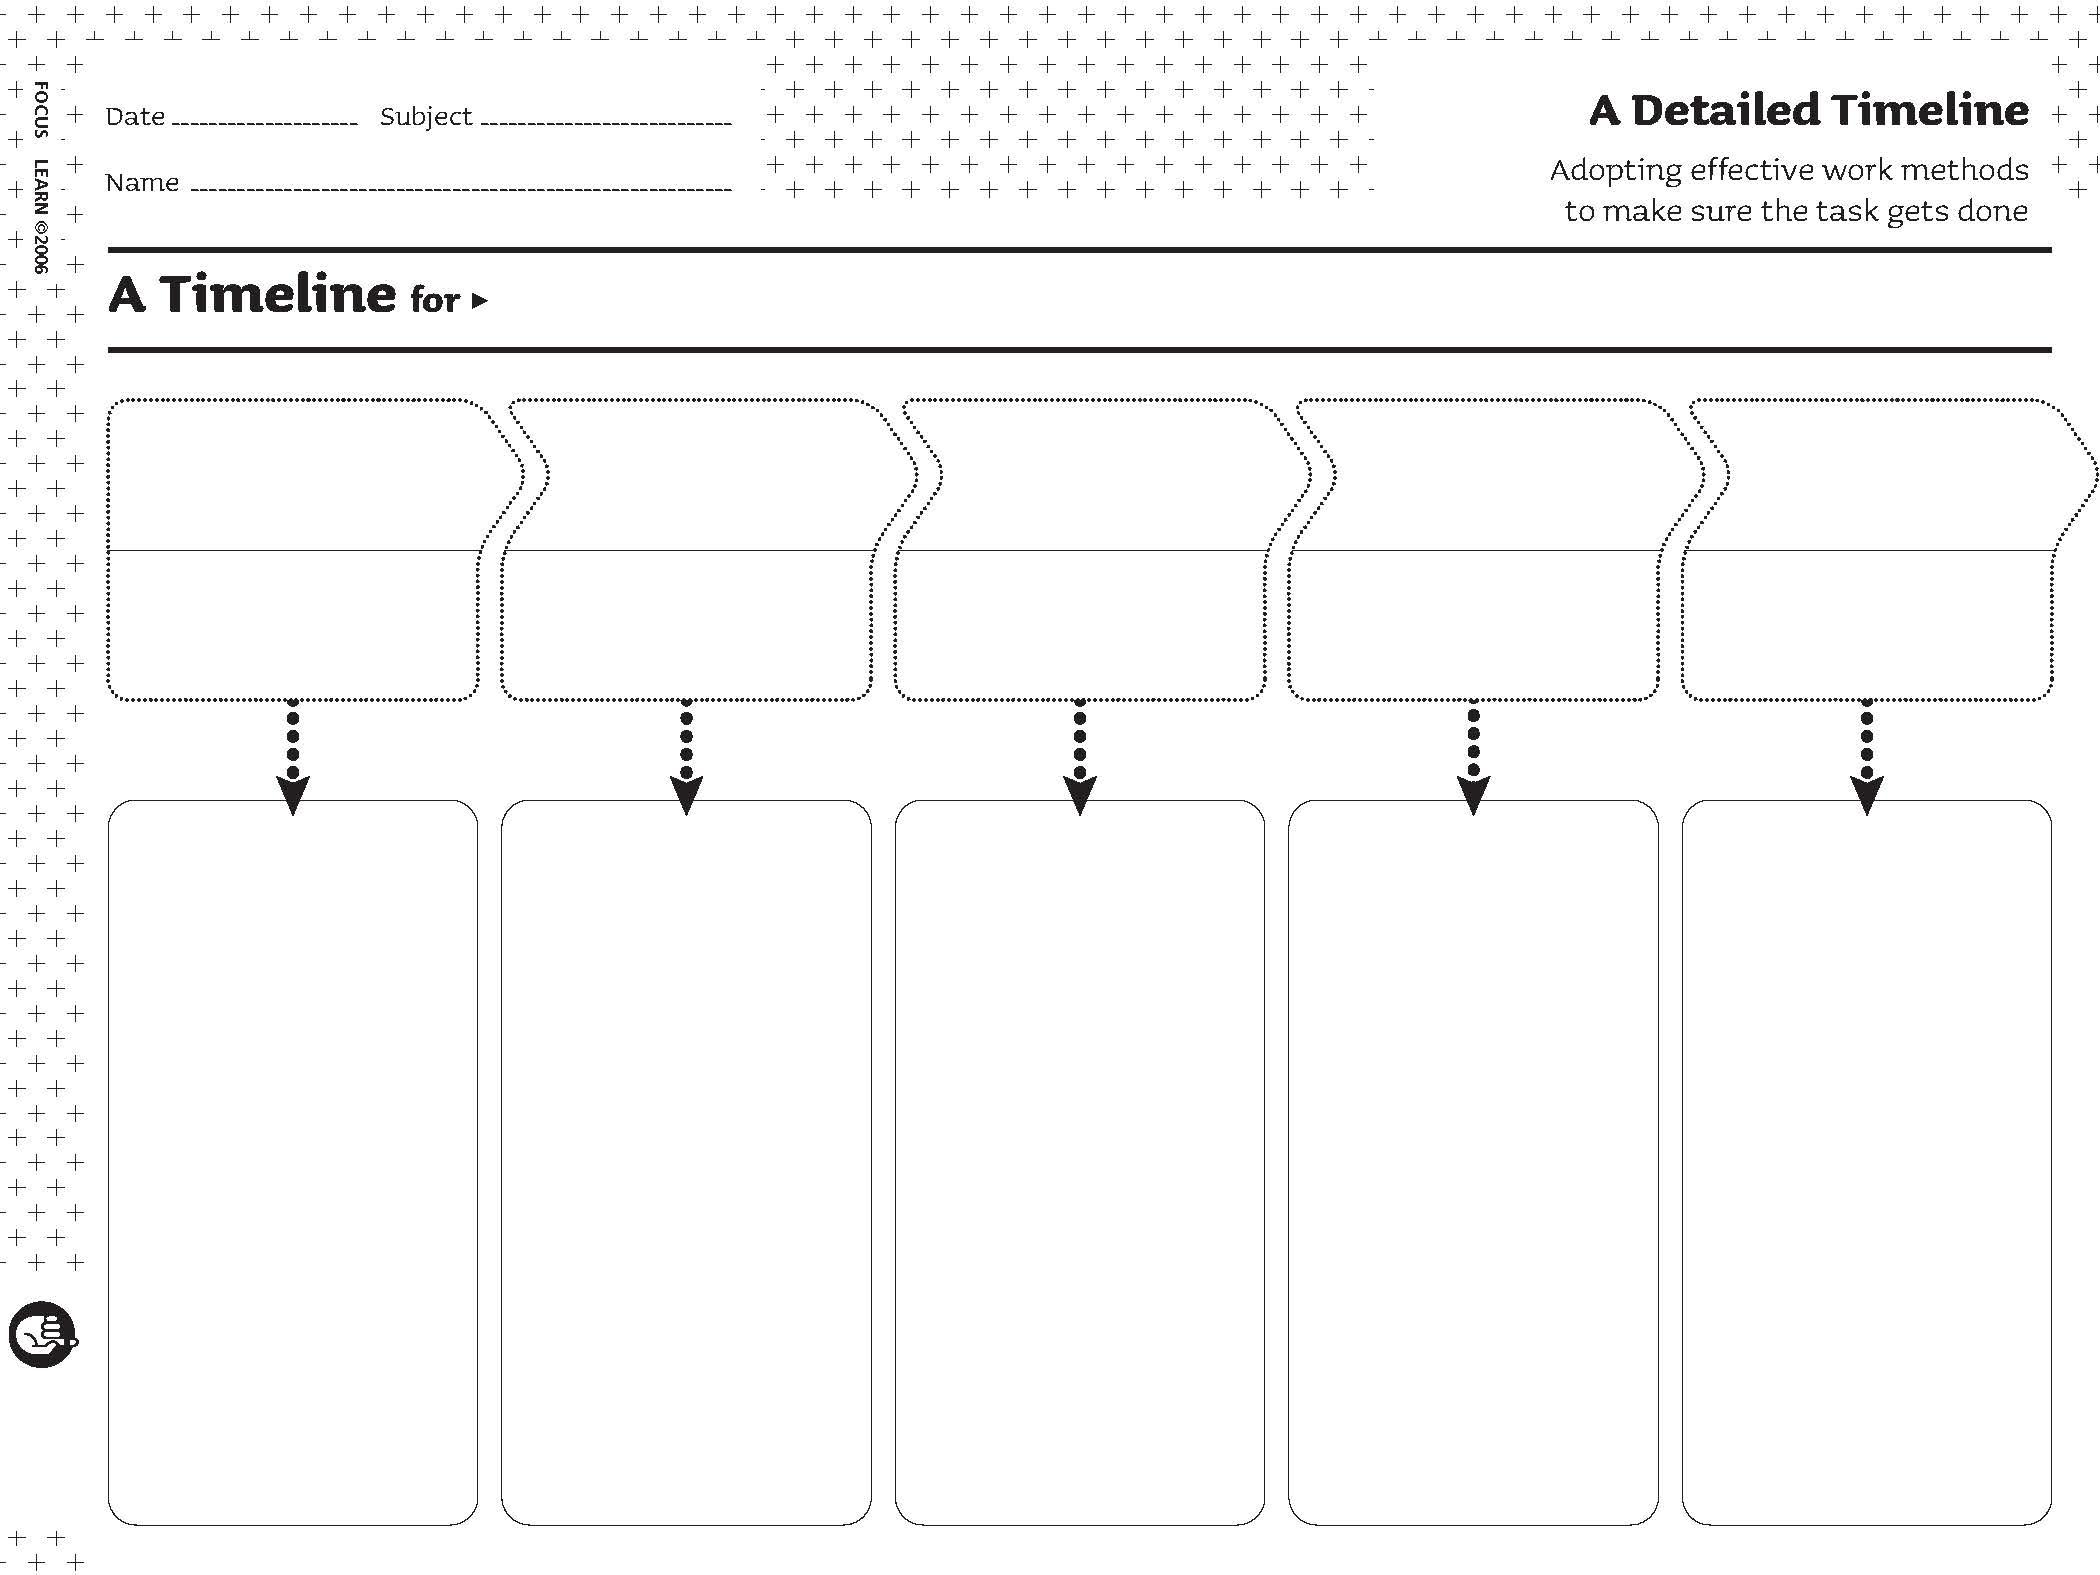 A Detailed Timeline